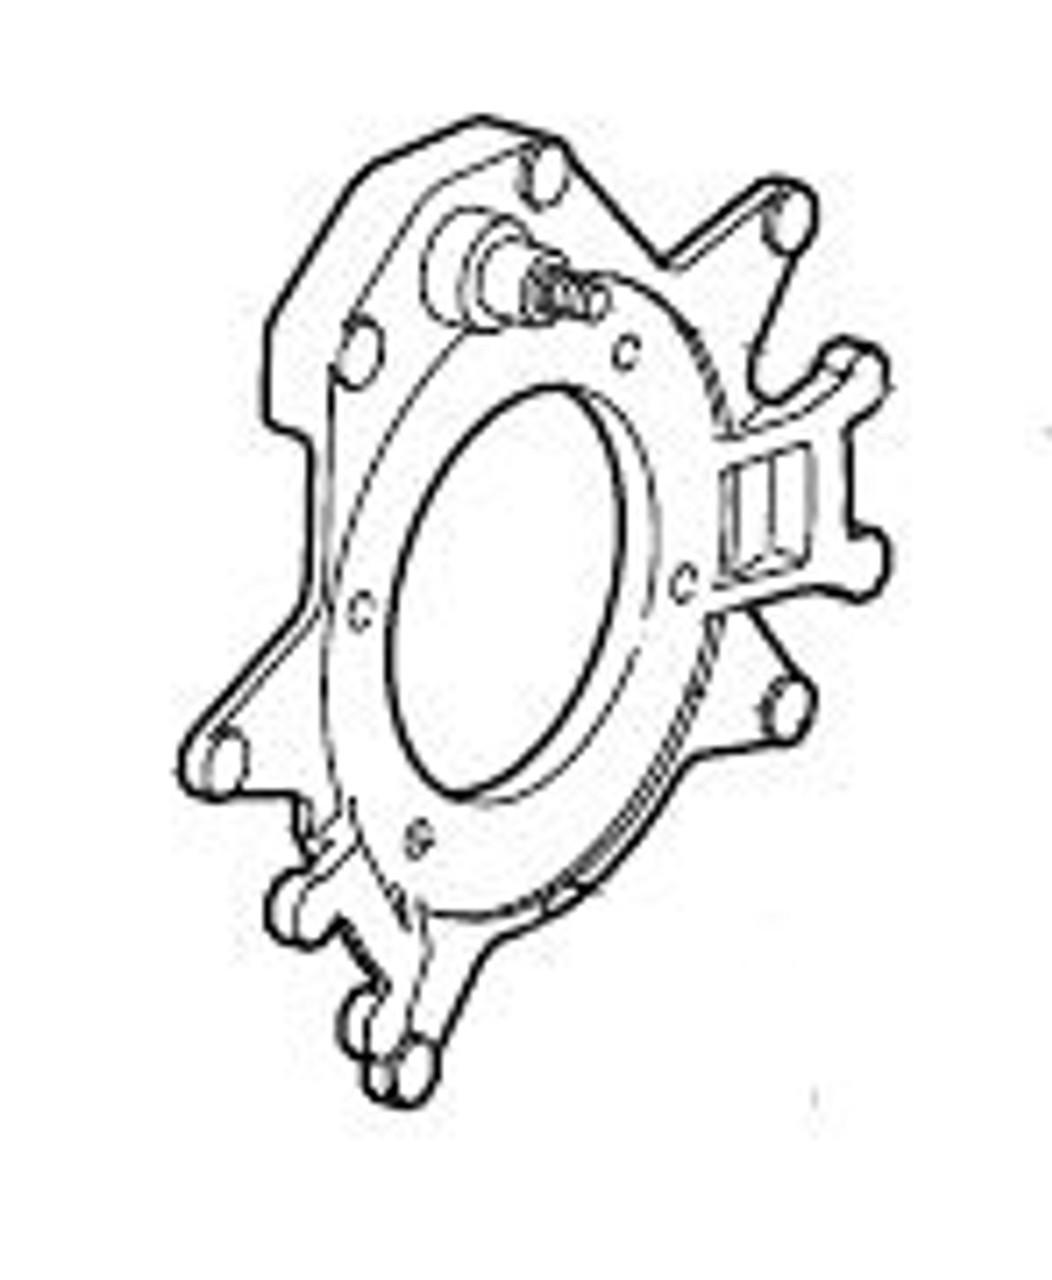 36-119-02 --- Cast Backing Assembly for 7.2k & 8k Capacity Dexter Electric Brake